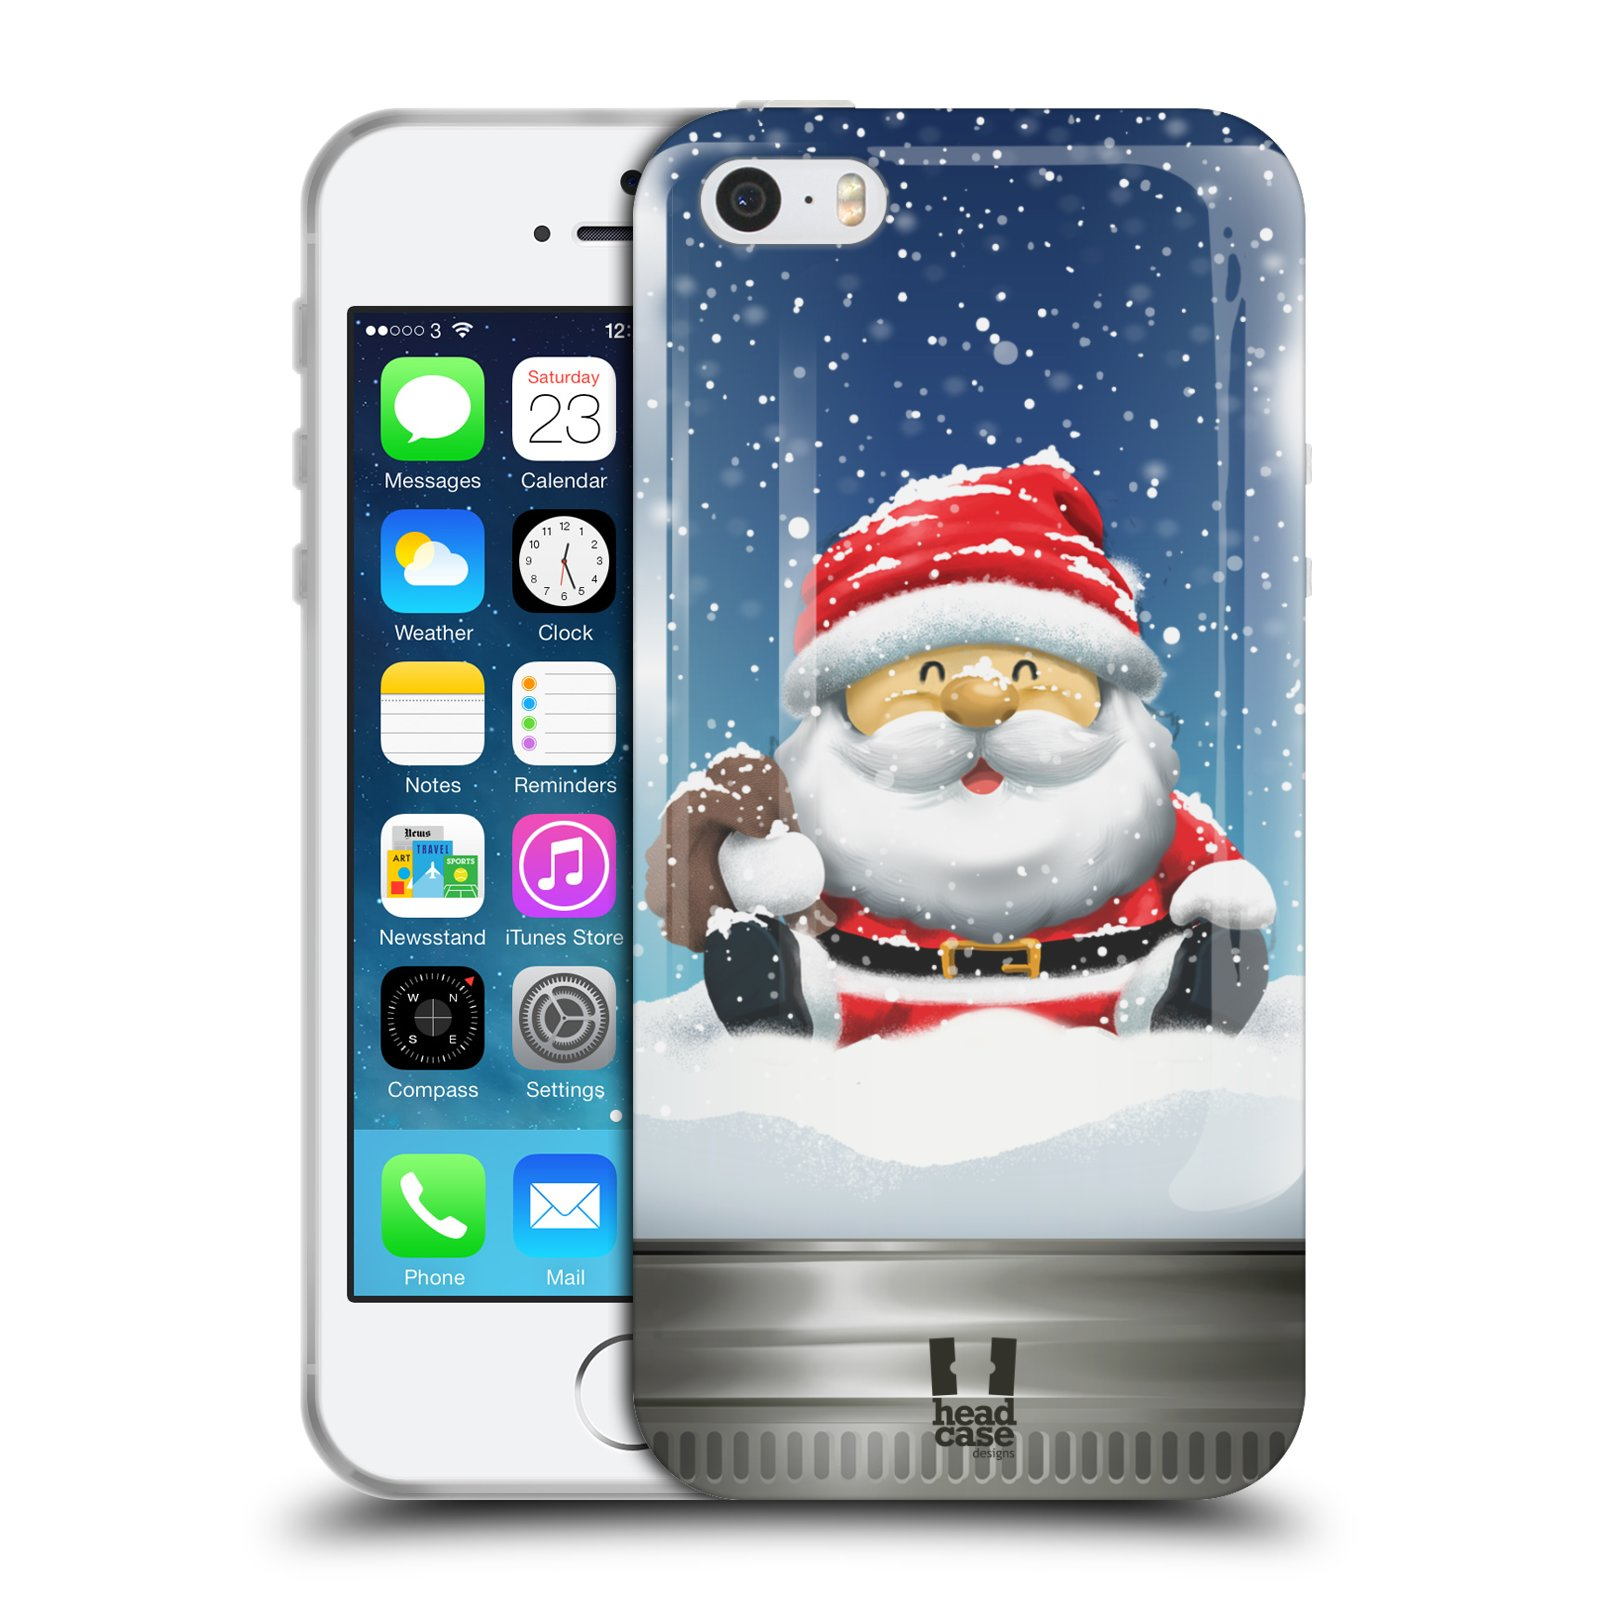 HEAD CASE silikonový obal na mobil Apple Iphone 5/5S vzor Vánoce v těžítku SANTA